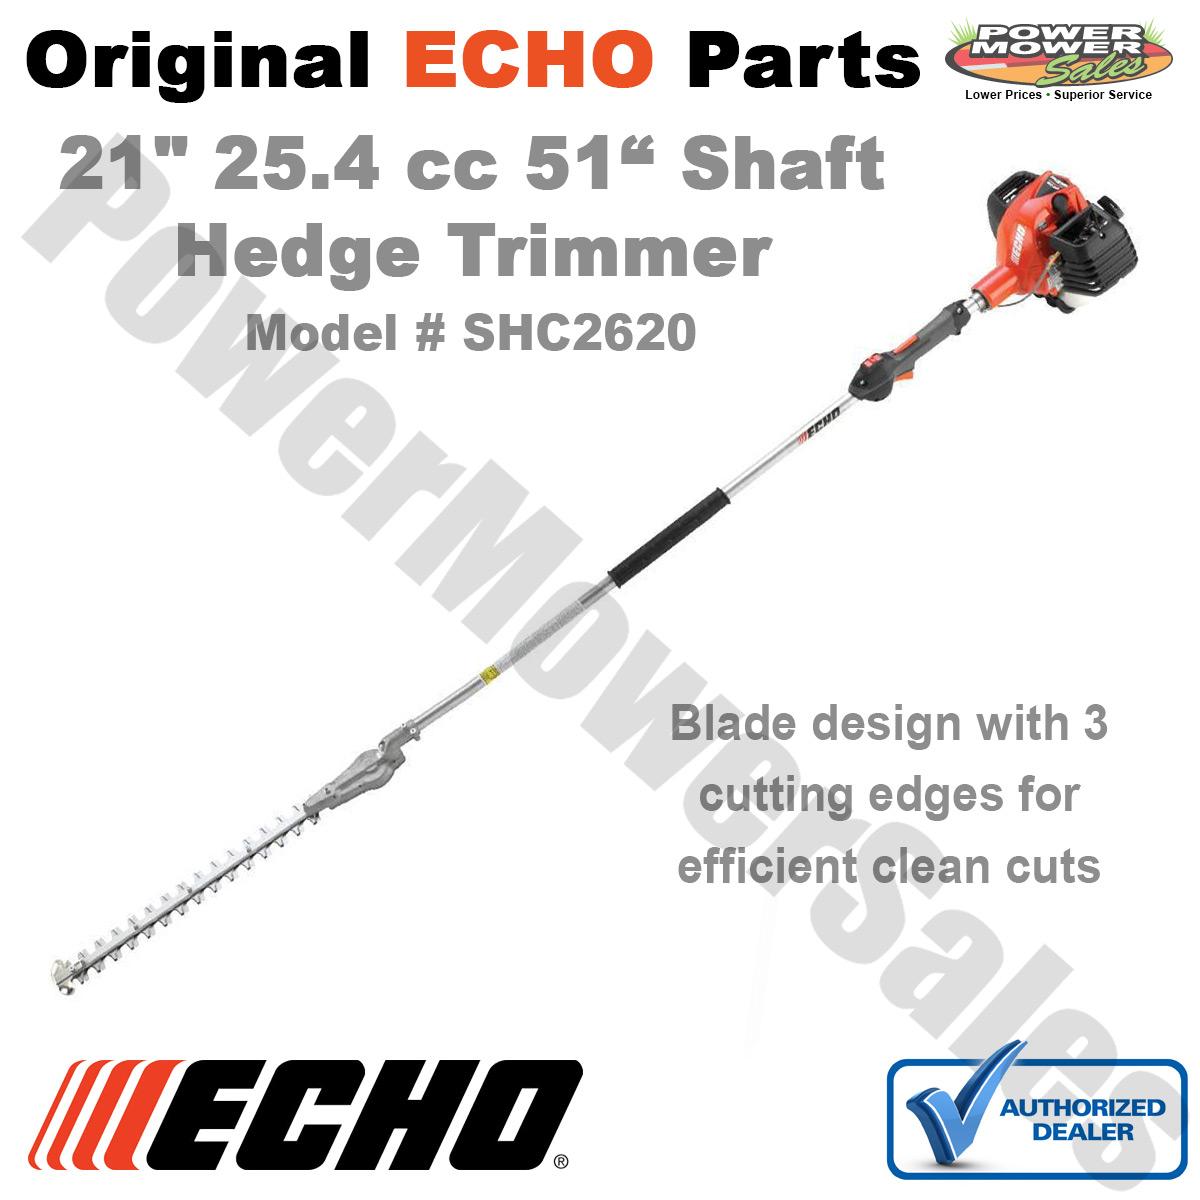 Shc2620 Echo 25 4 Cc Gas 2 Stroke Cycle 21 Double Sided Hedge Trimmer 51 Shaft 743184014639 Ebay